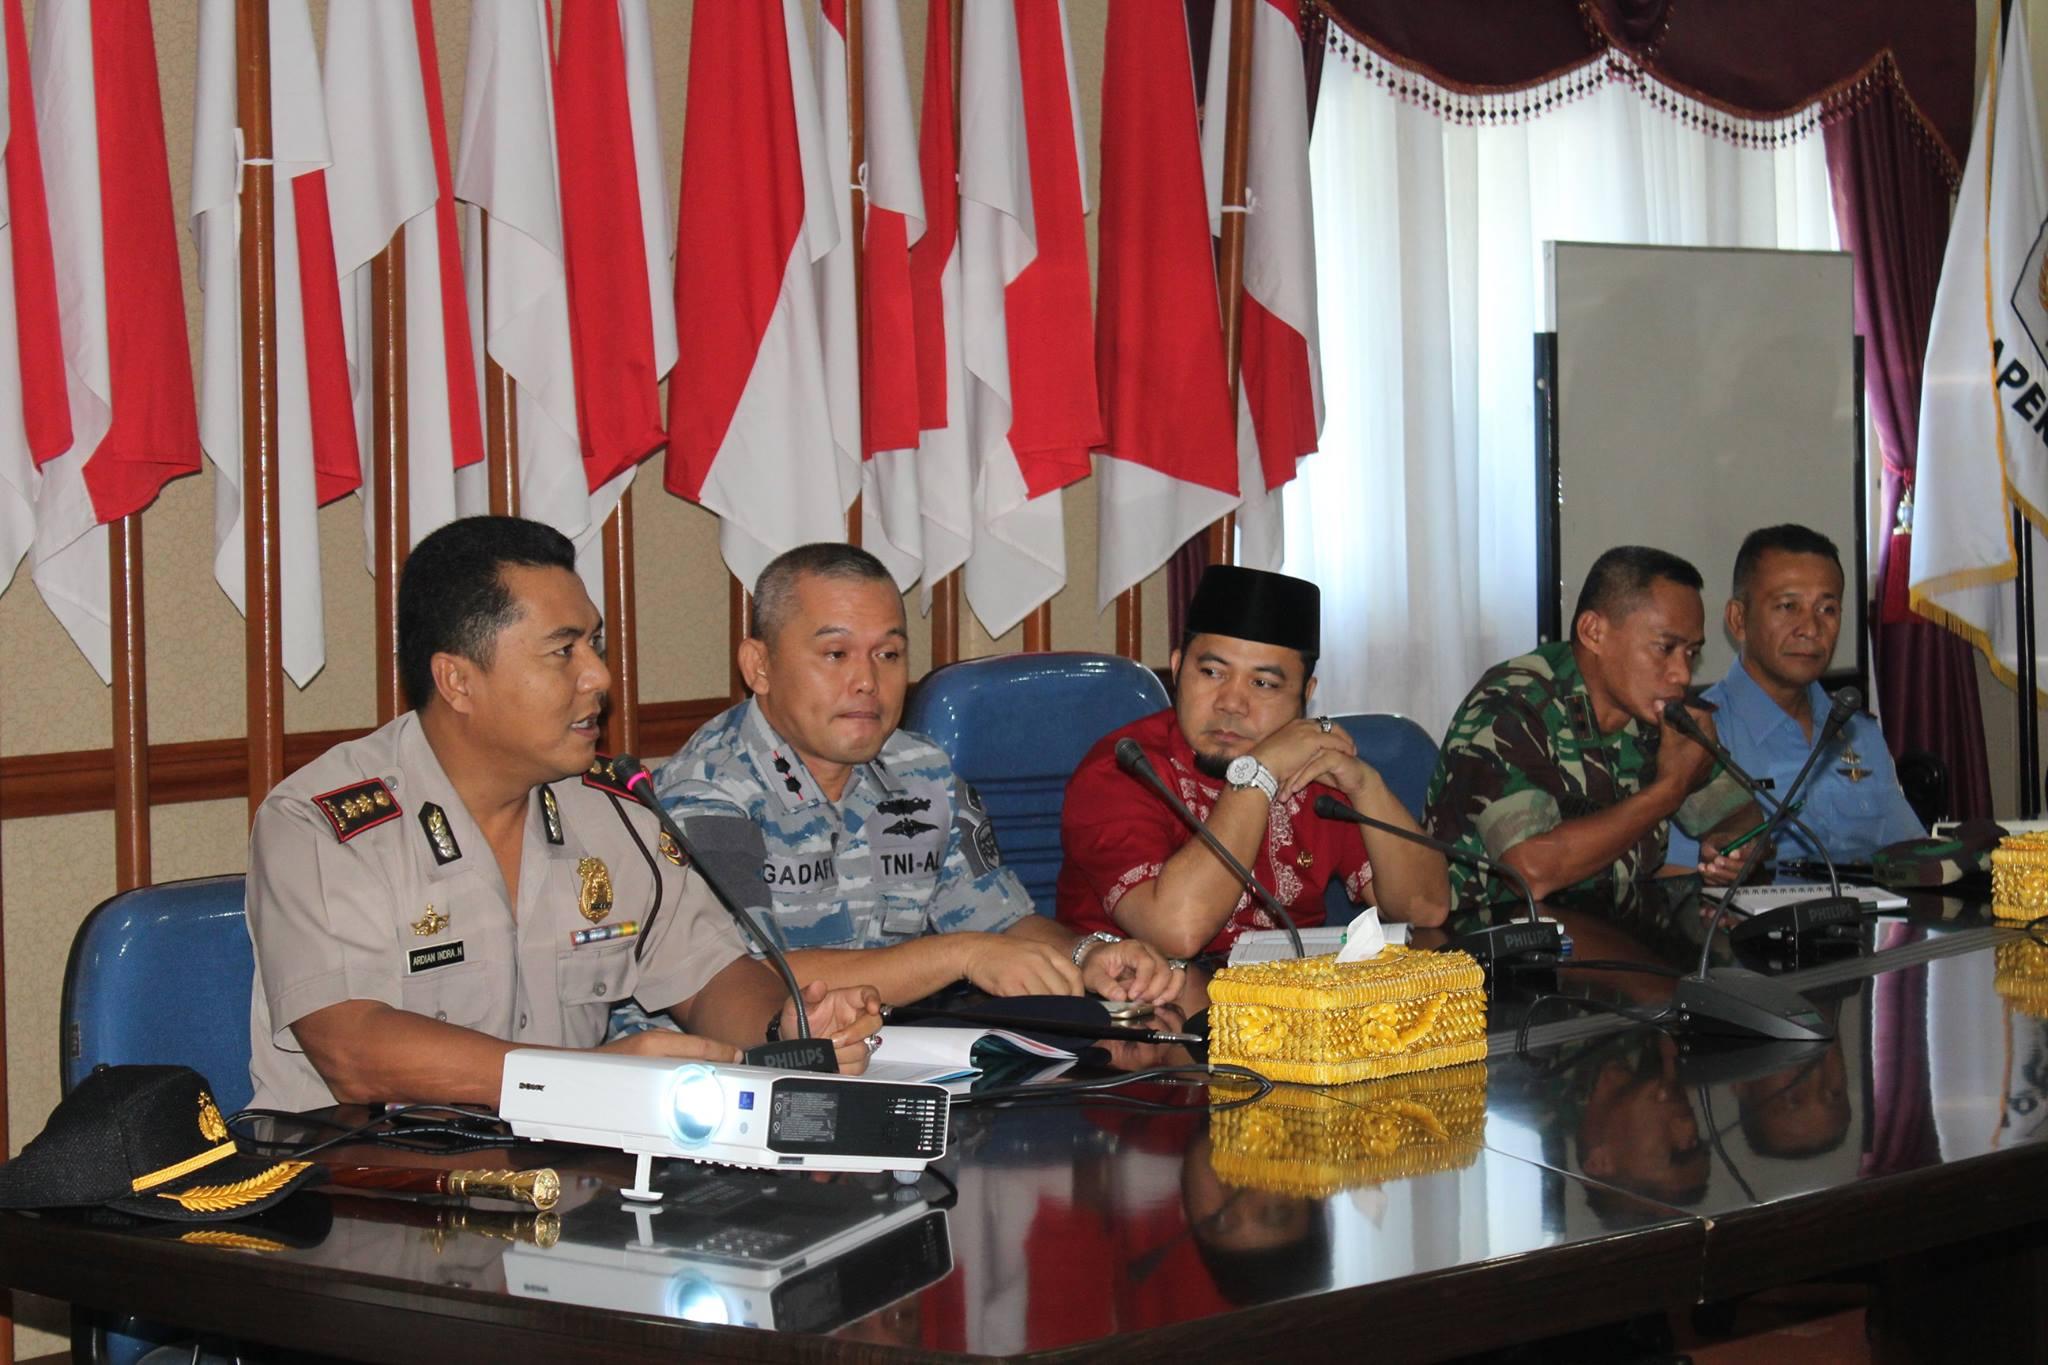 Rapat Koordinasi Pengamanan Hari Raya Idul Fitri 2016 di Kantor Walikota Bengkulu